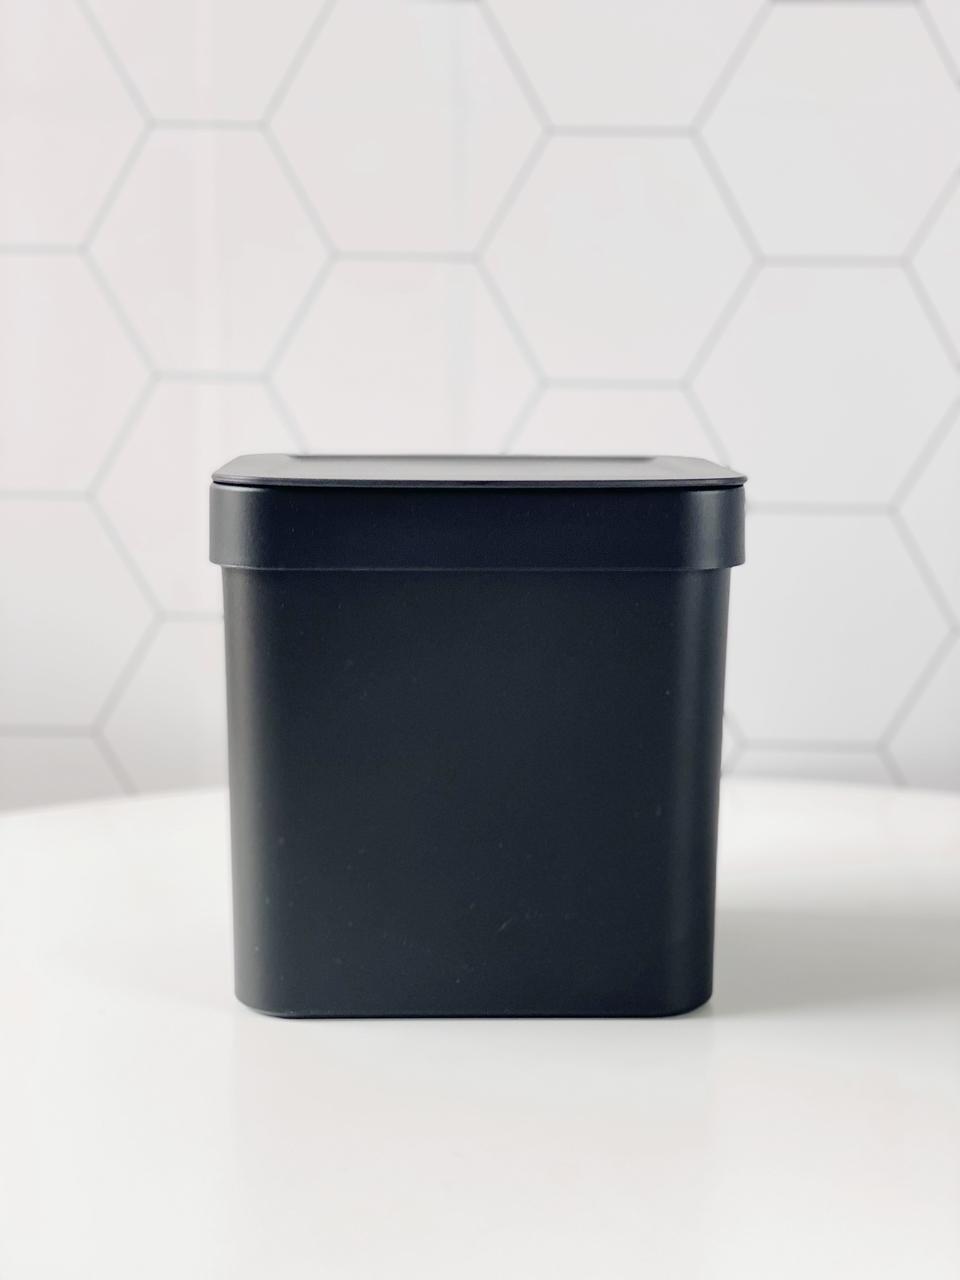 Lixeira Para Pia De Cozinha - 2,5 Litros  - CASACOBRE